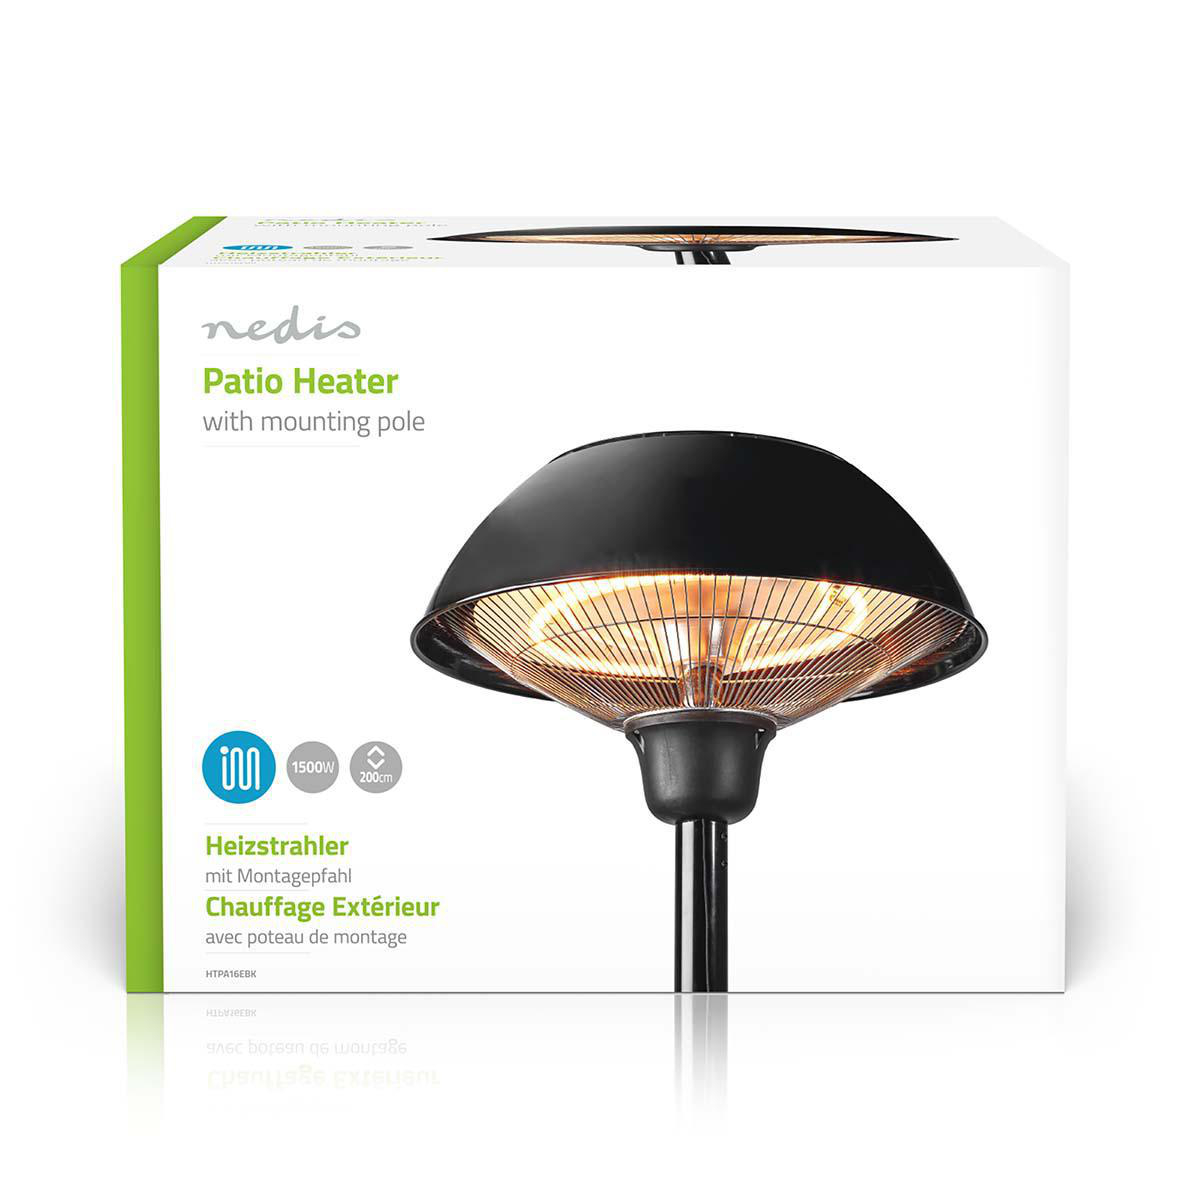 patio heater 1500 w 1 heat setting